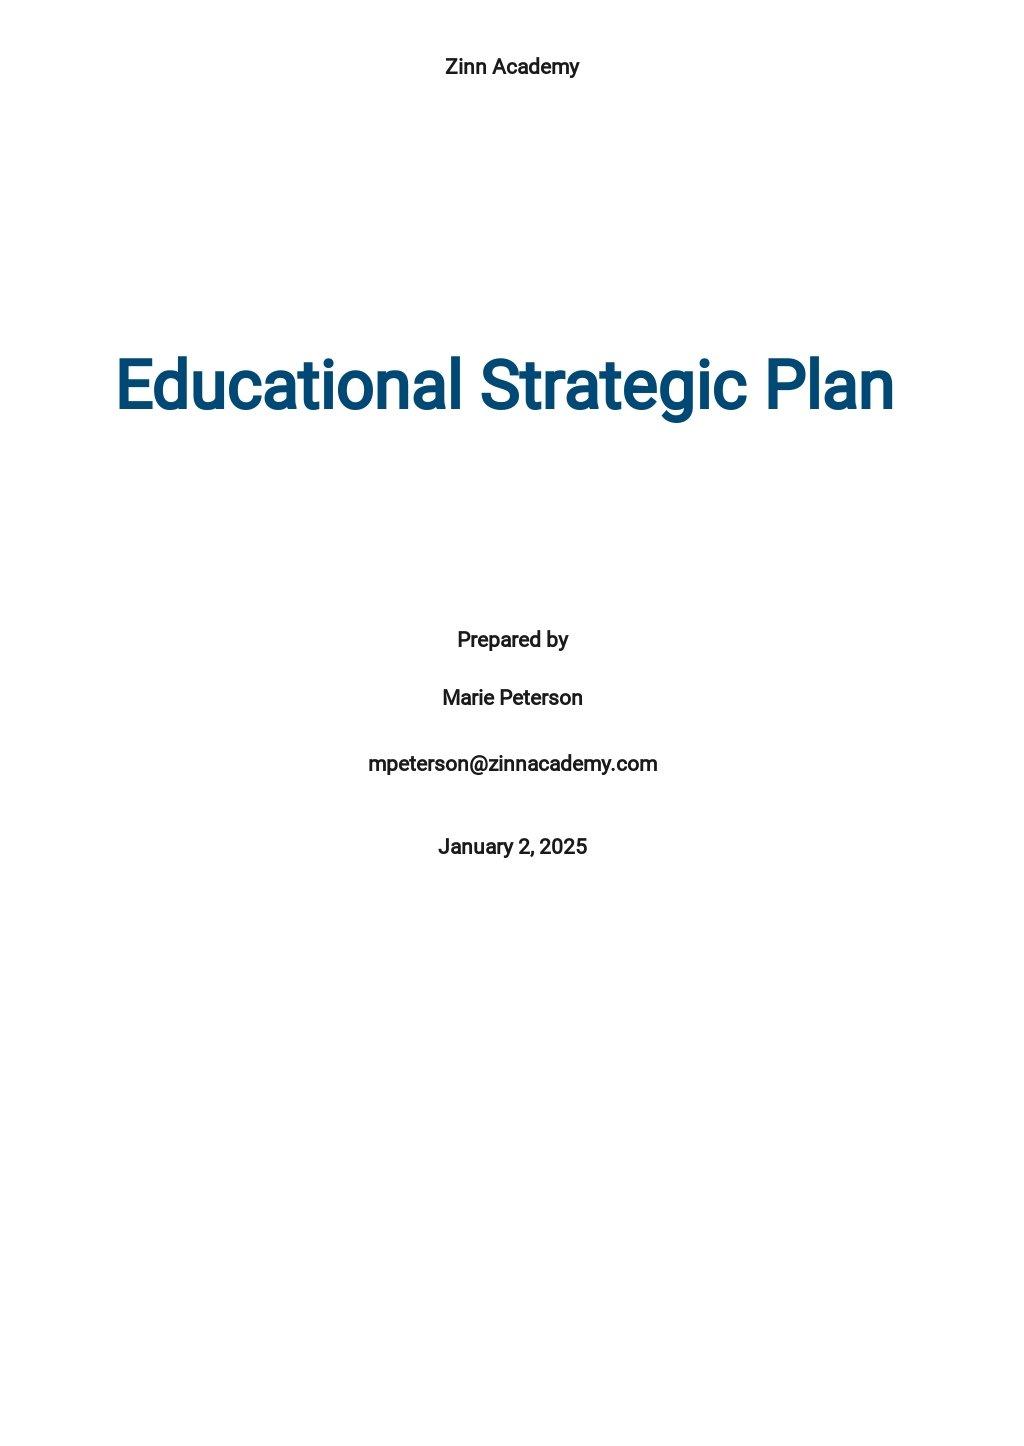 Educational Strategic Plan Template.jpe